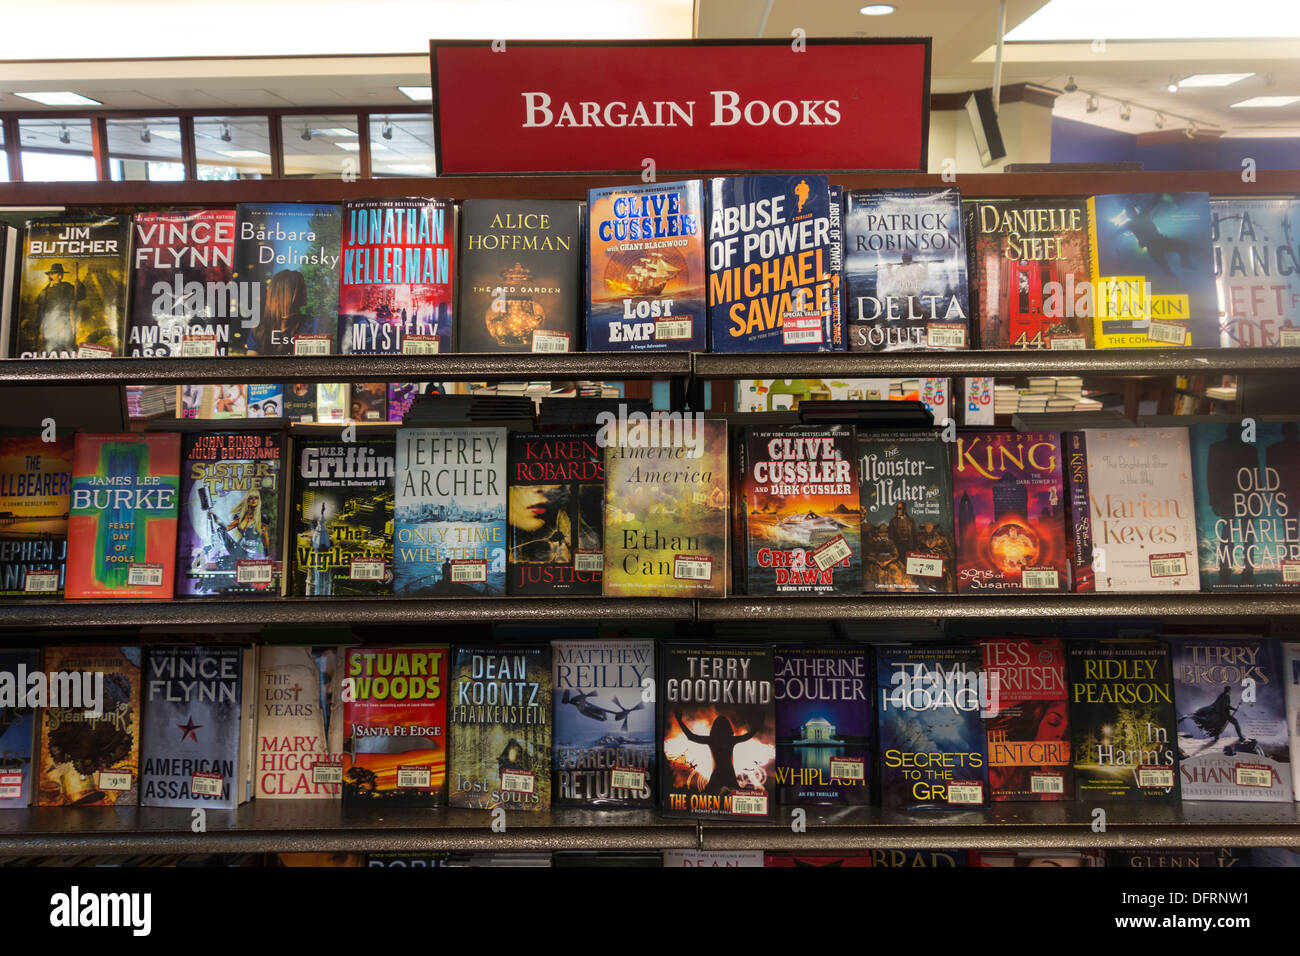 Bargain books bookshelf, University of Pennsylvania Bookstore, Philadelphia, USA - Stock Image